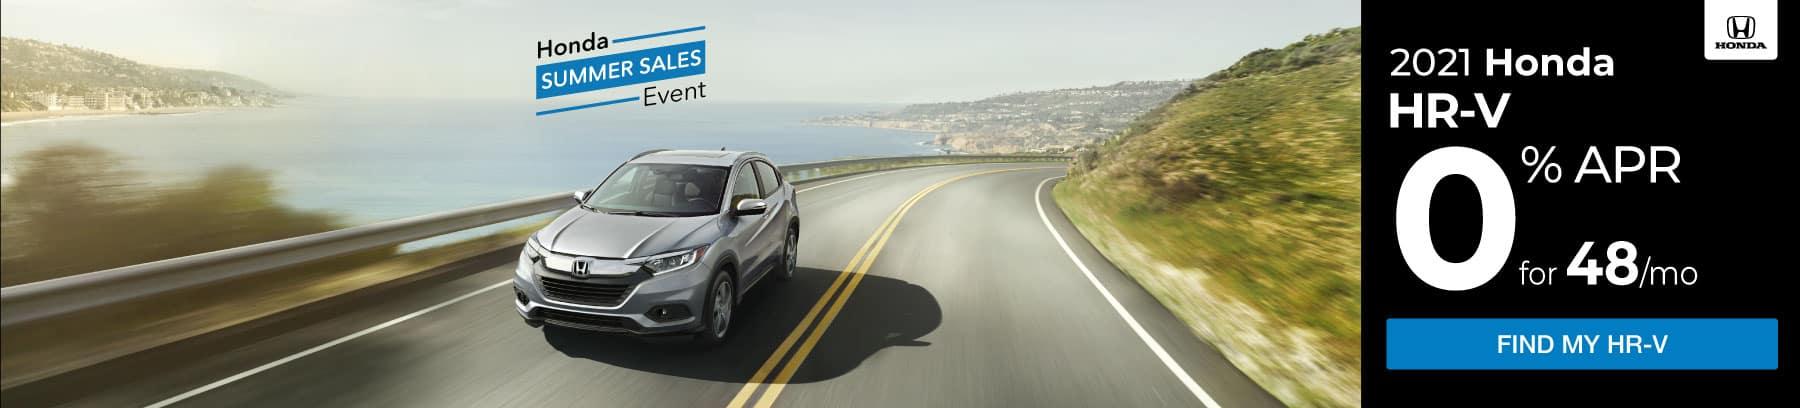 Honda Summer Sales Event 2021 HR-V 0% APR